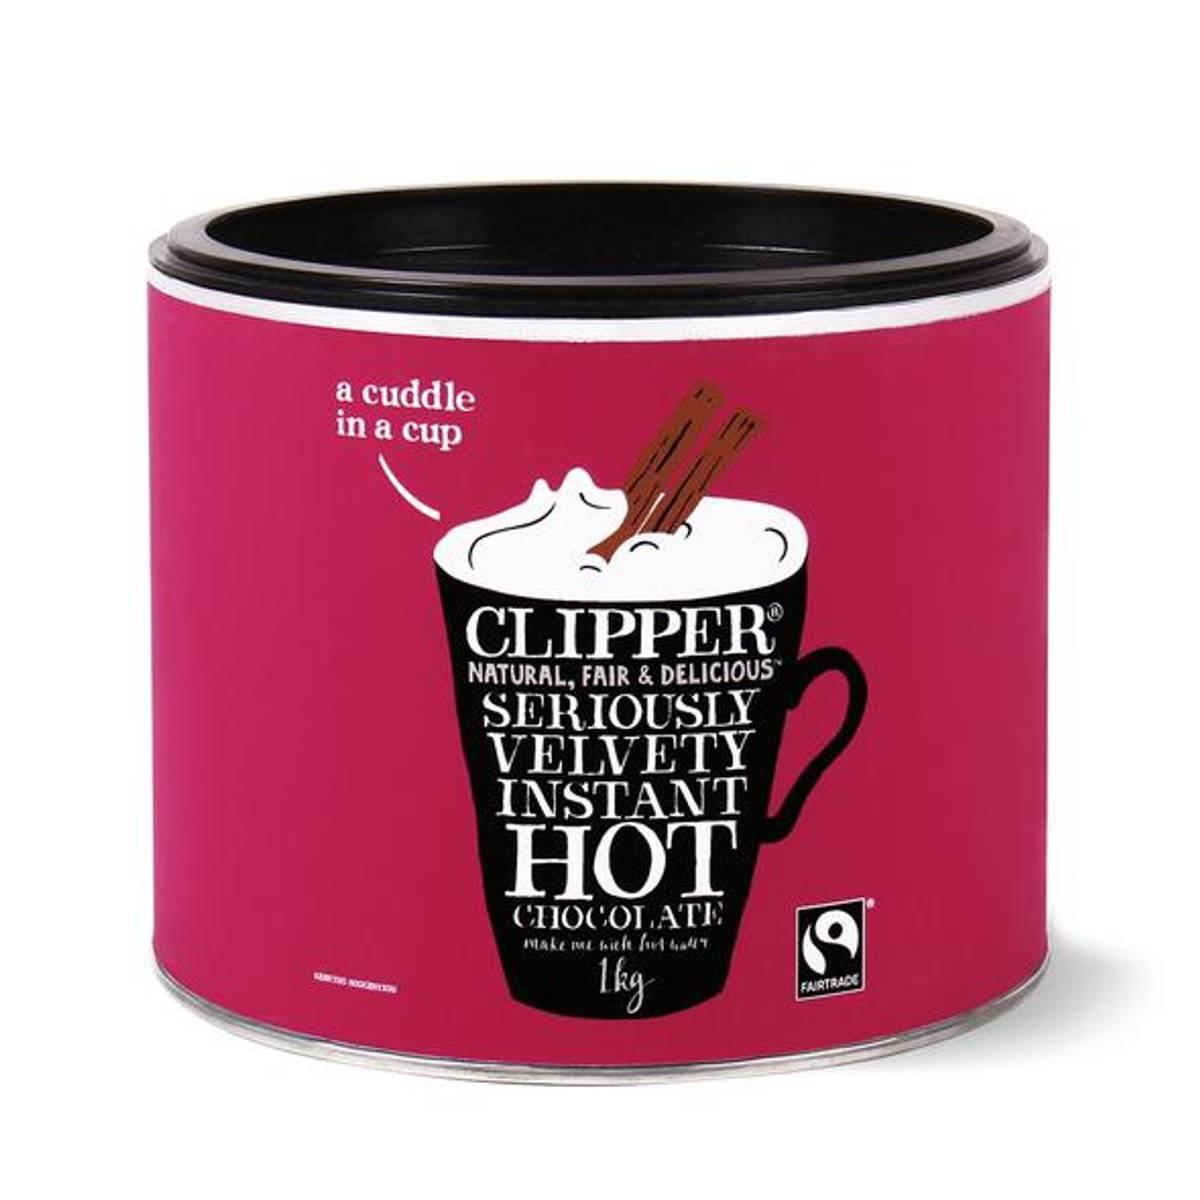 1 kg kakaopulver - Hot Chocolate / Clipper